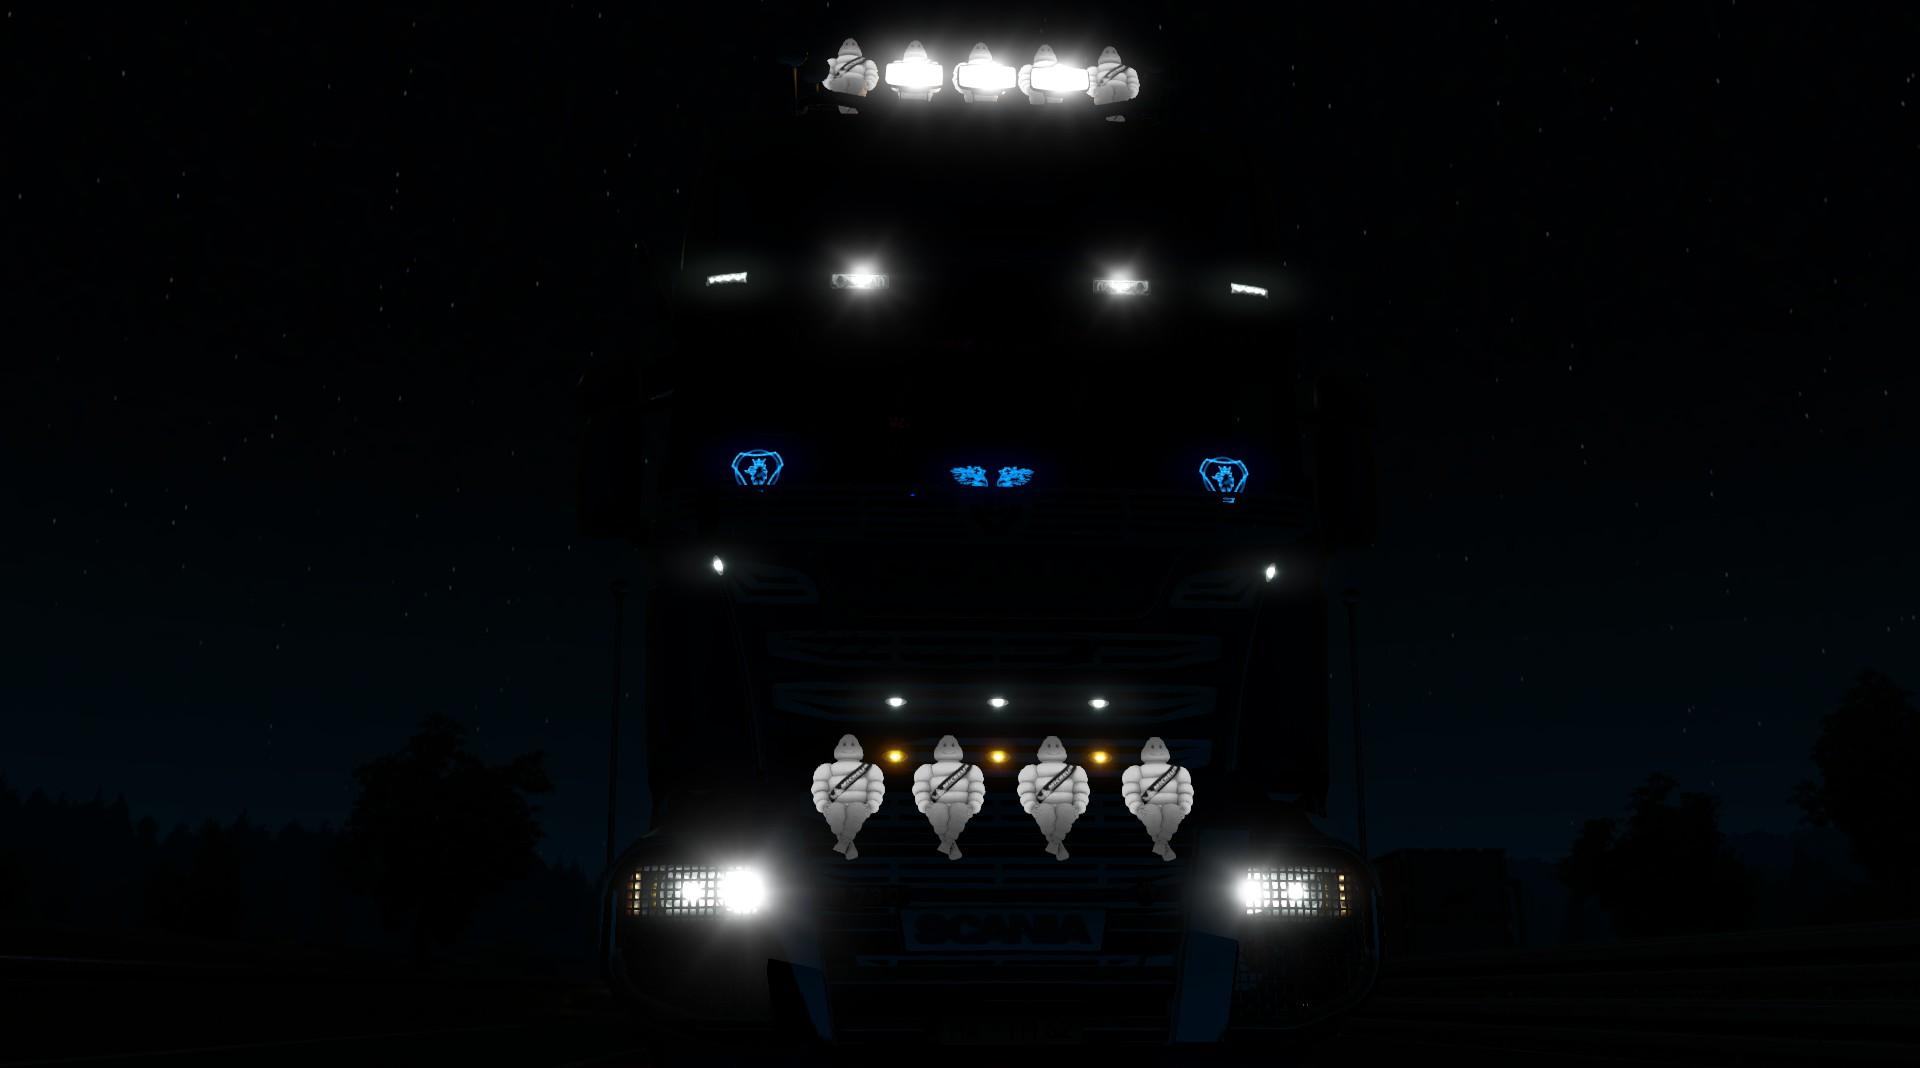 20190207024253_1.jpg - Euro Truck Simulator 2